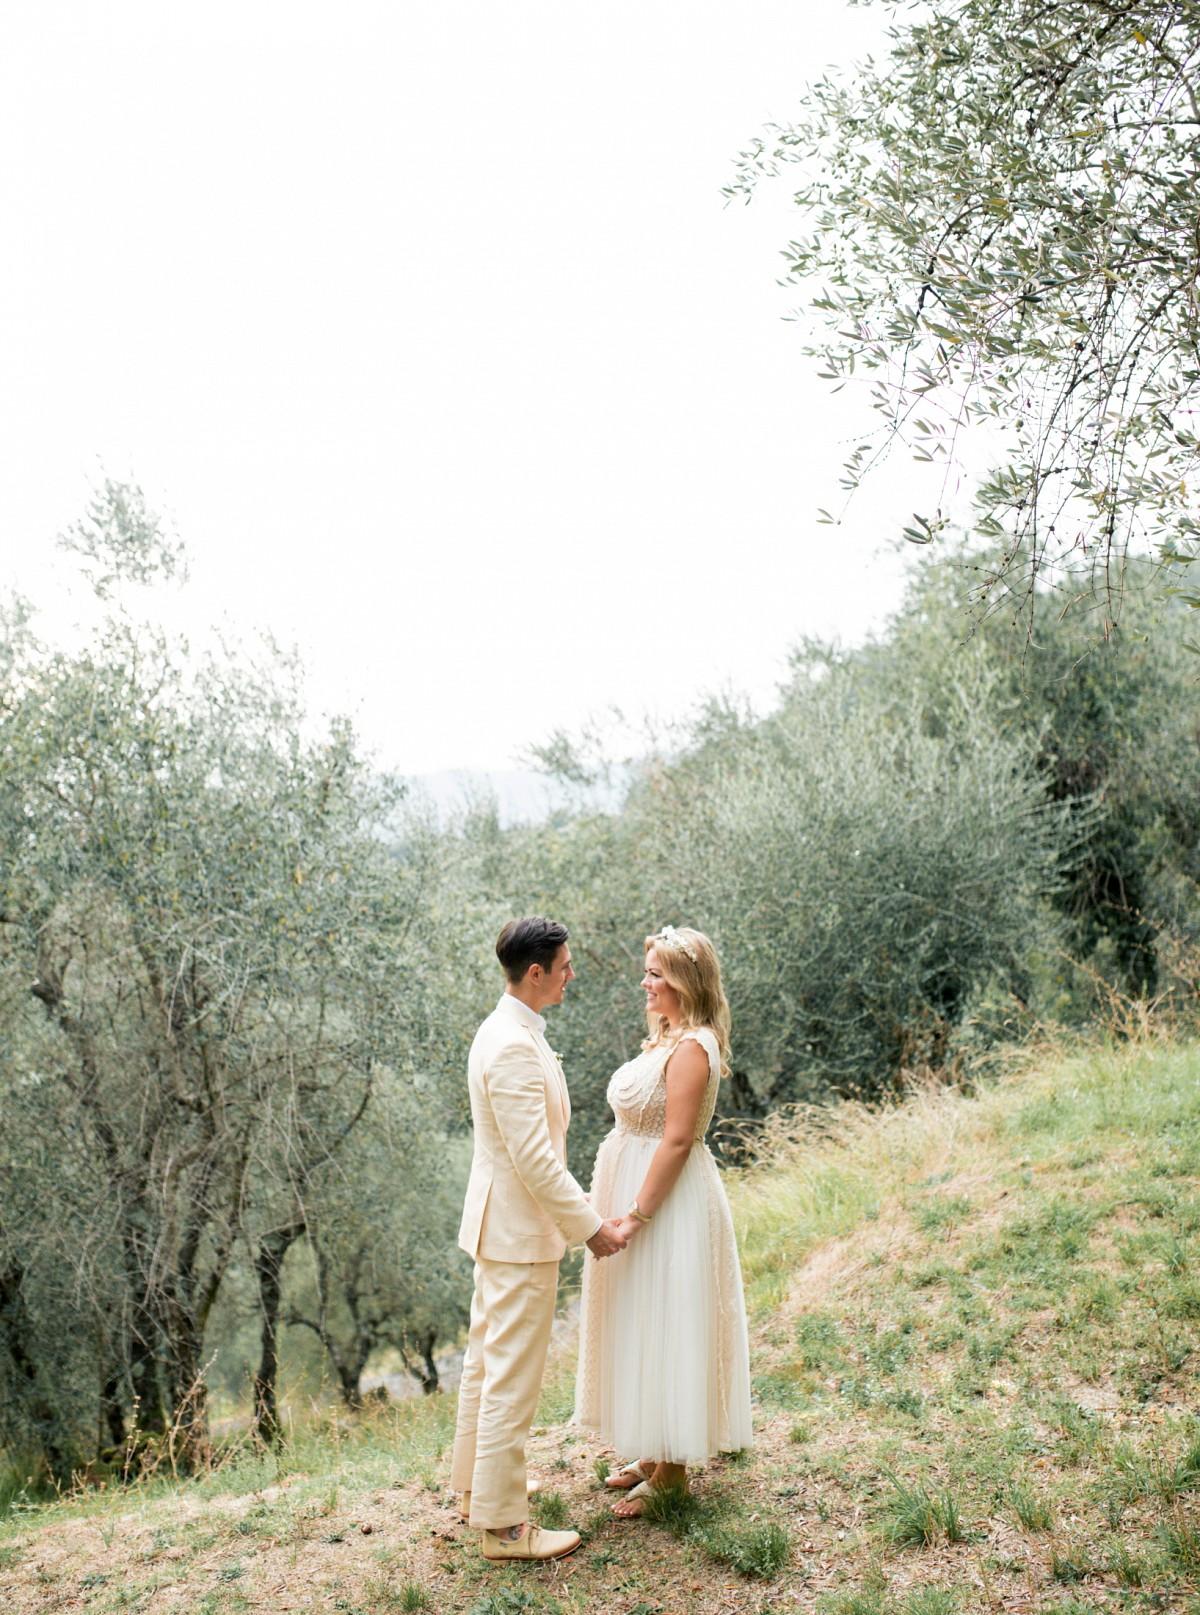 Tuscany Villa Wedding with Rustic Florals